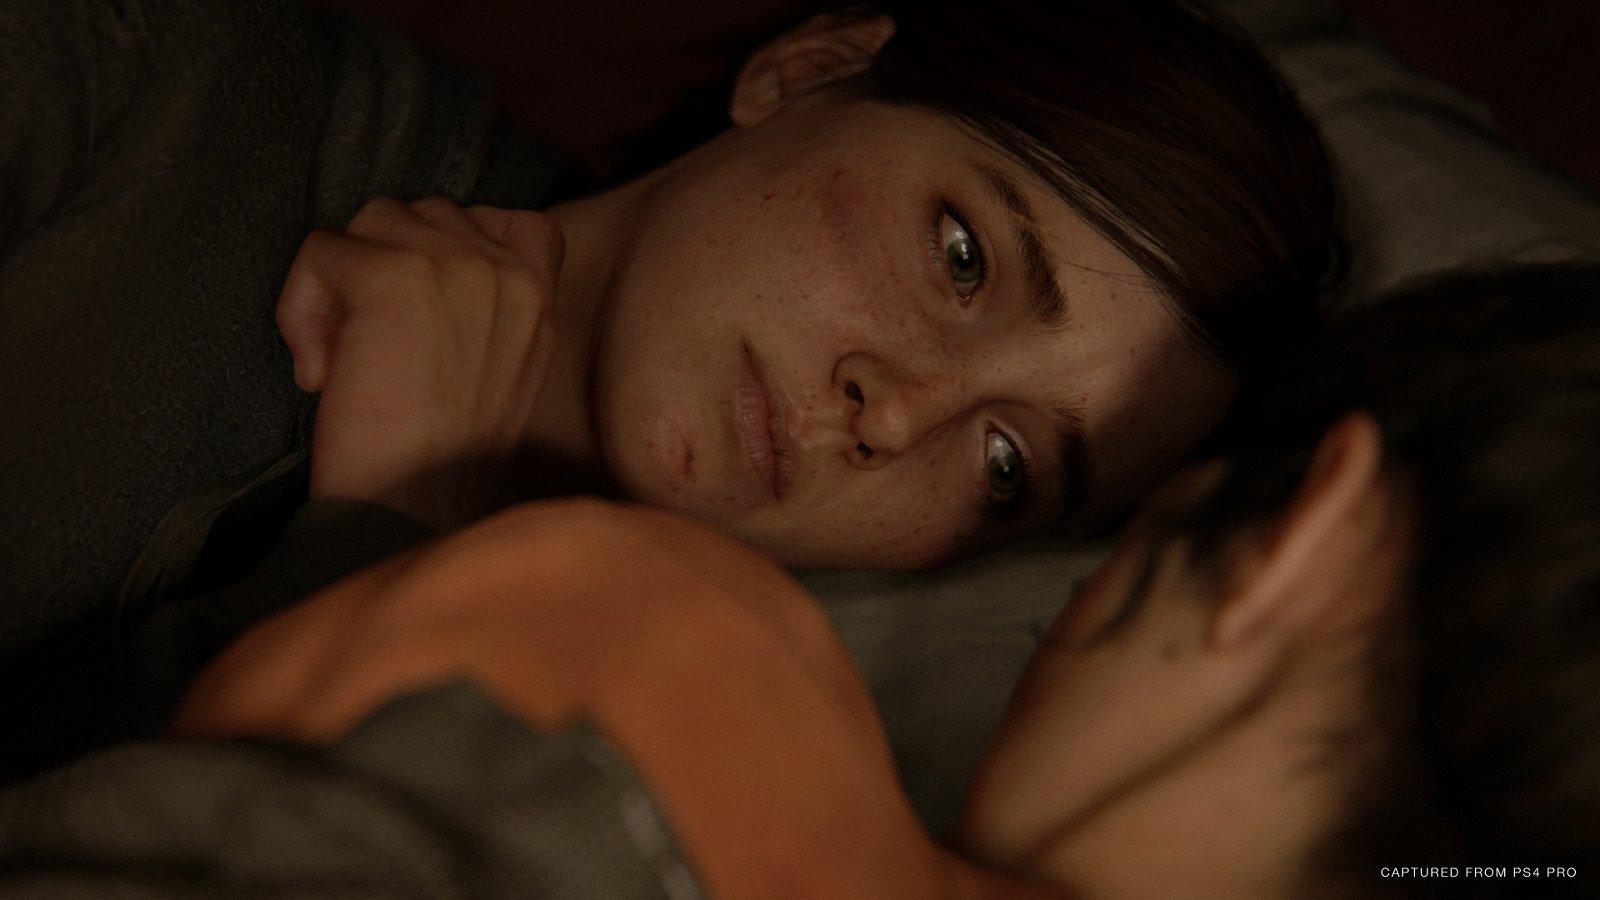 The Last of Us Part II image 1